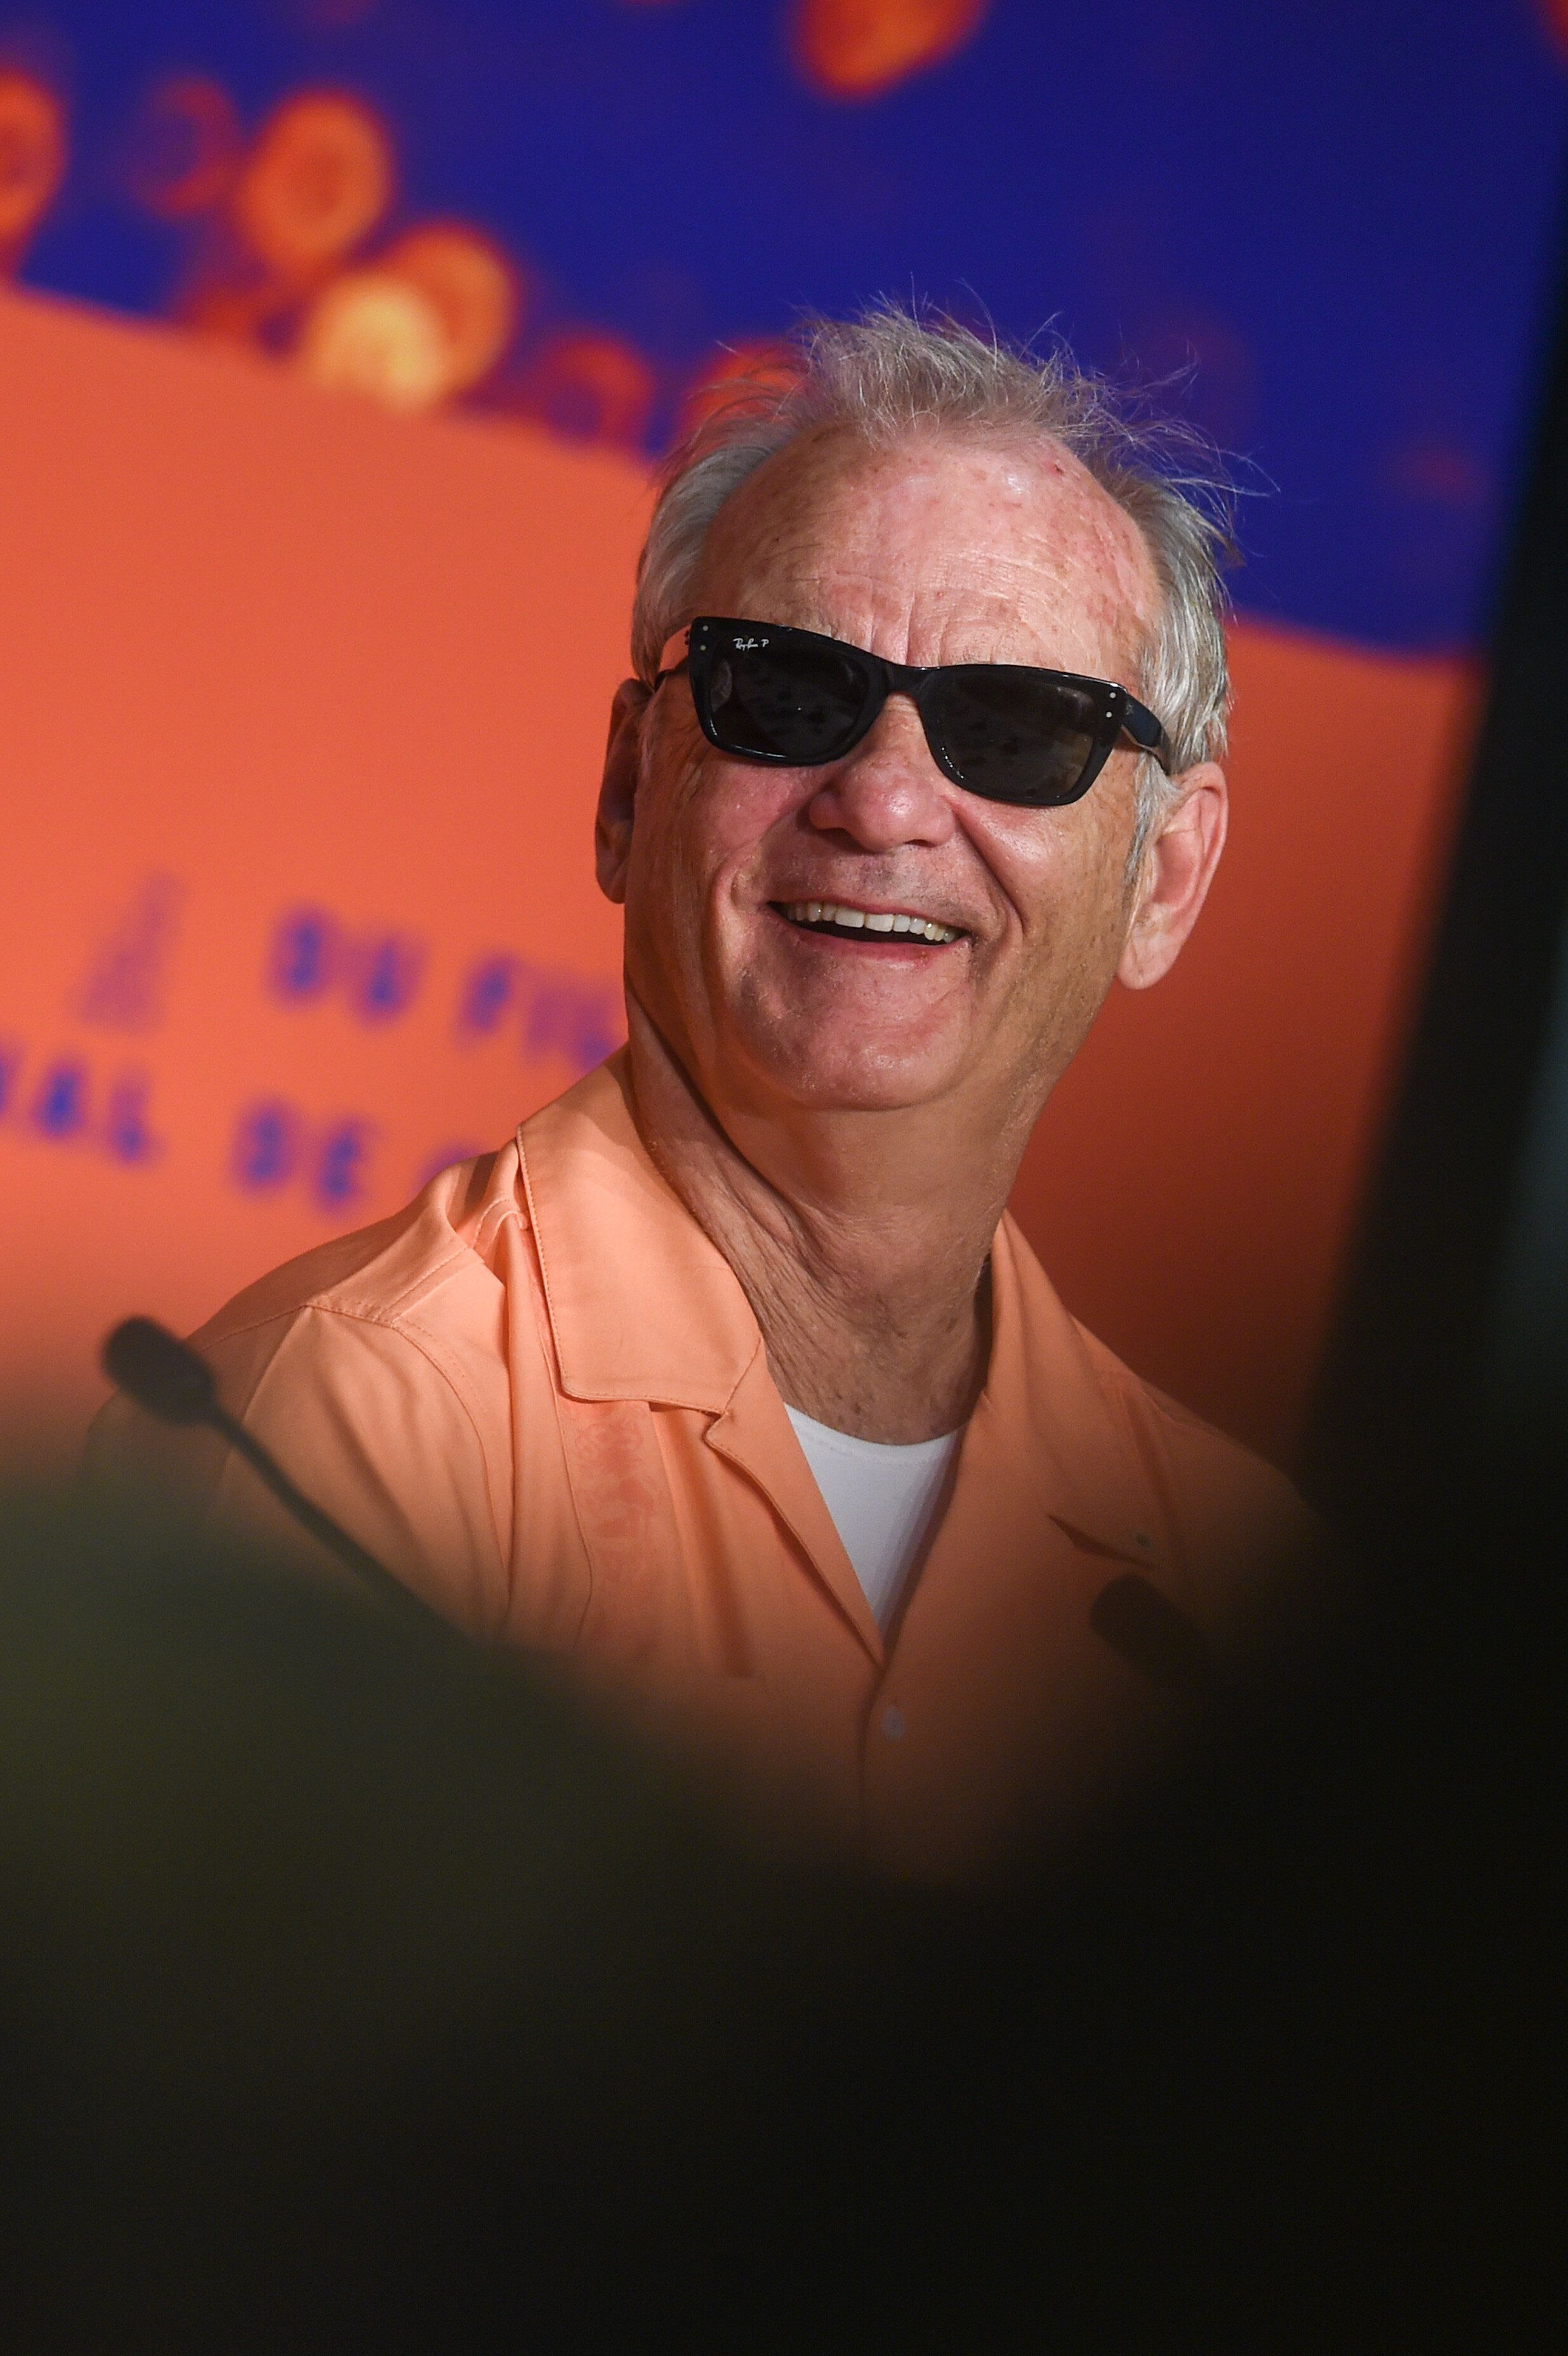 'Cannes me dá medo', diz Bill Murray em coletiva de 'The Dead Don't Die' no